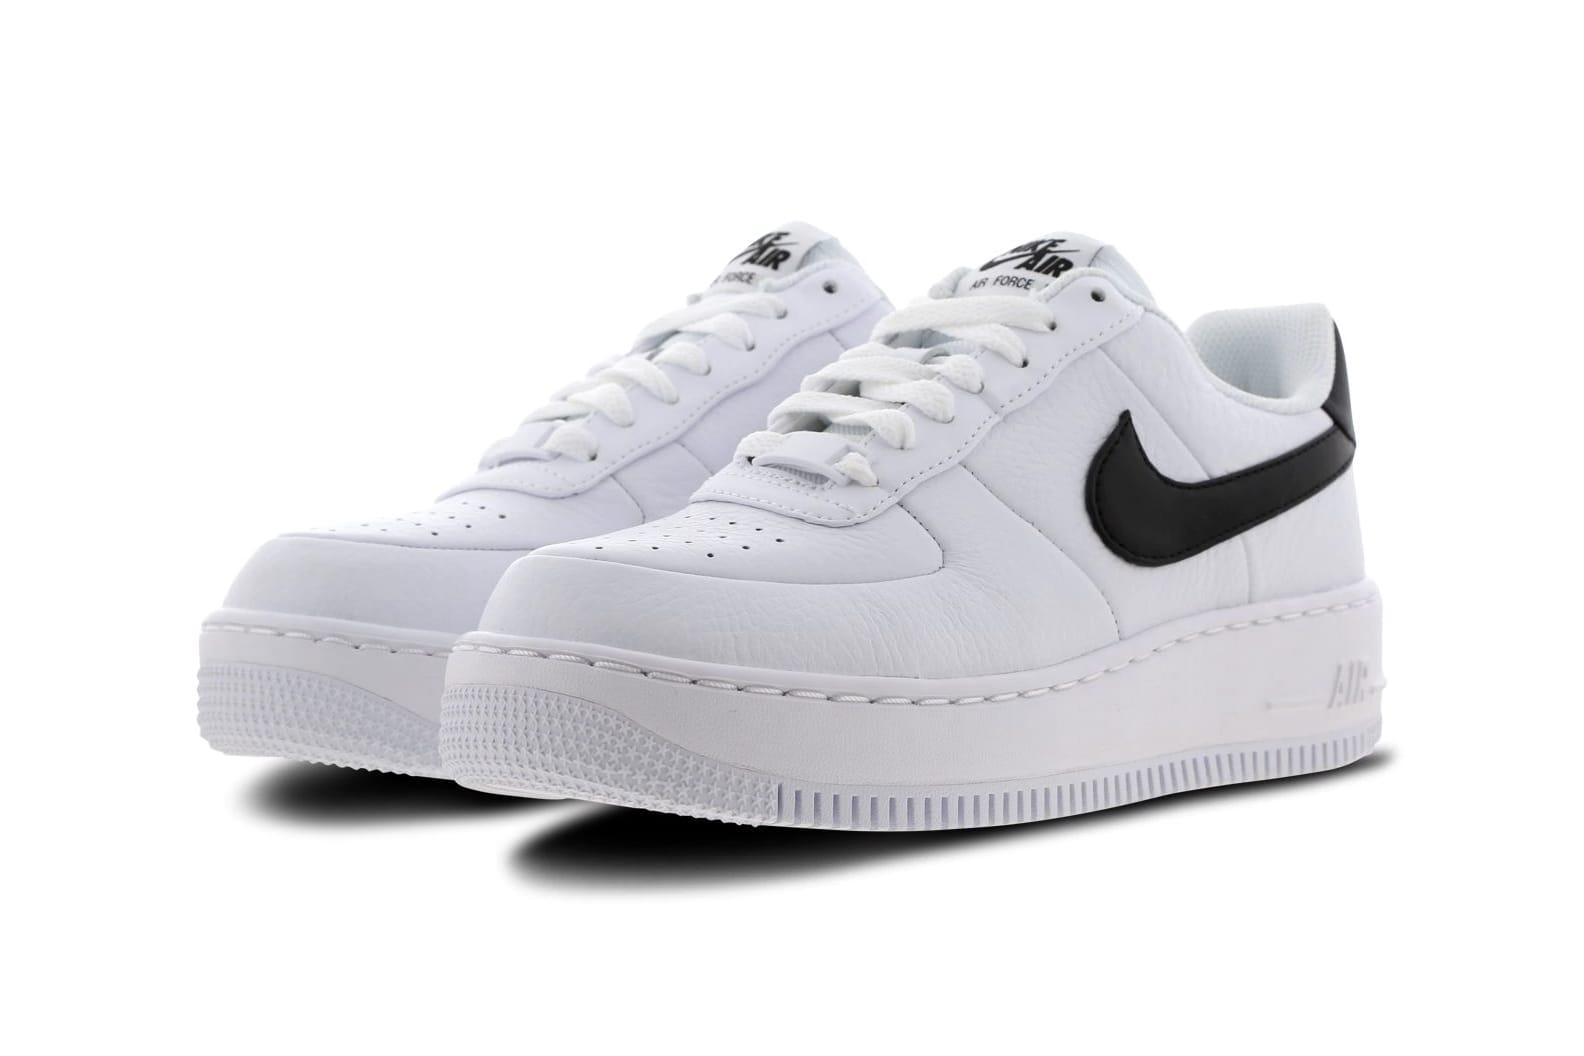 Nike Air Force 1 Upstep Monochrome